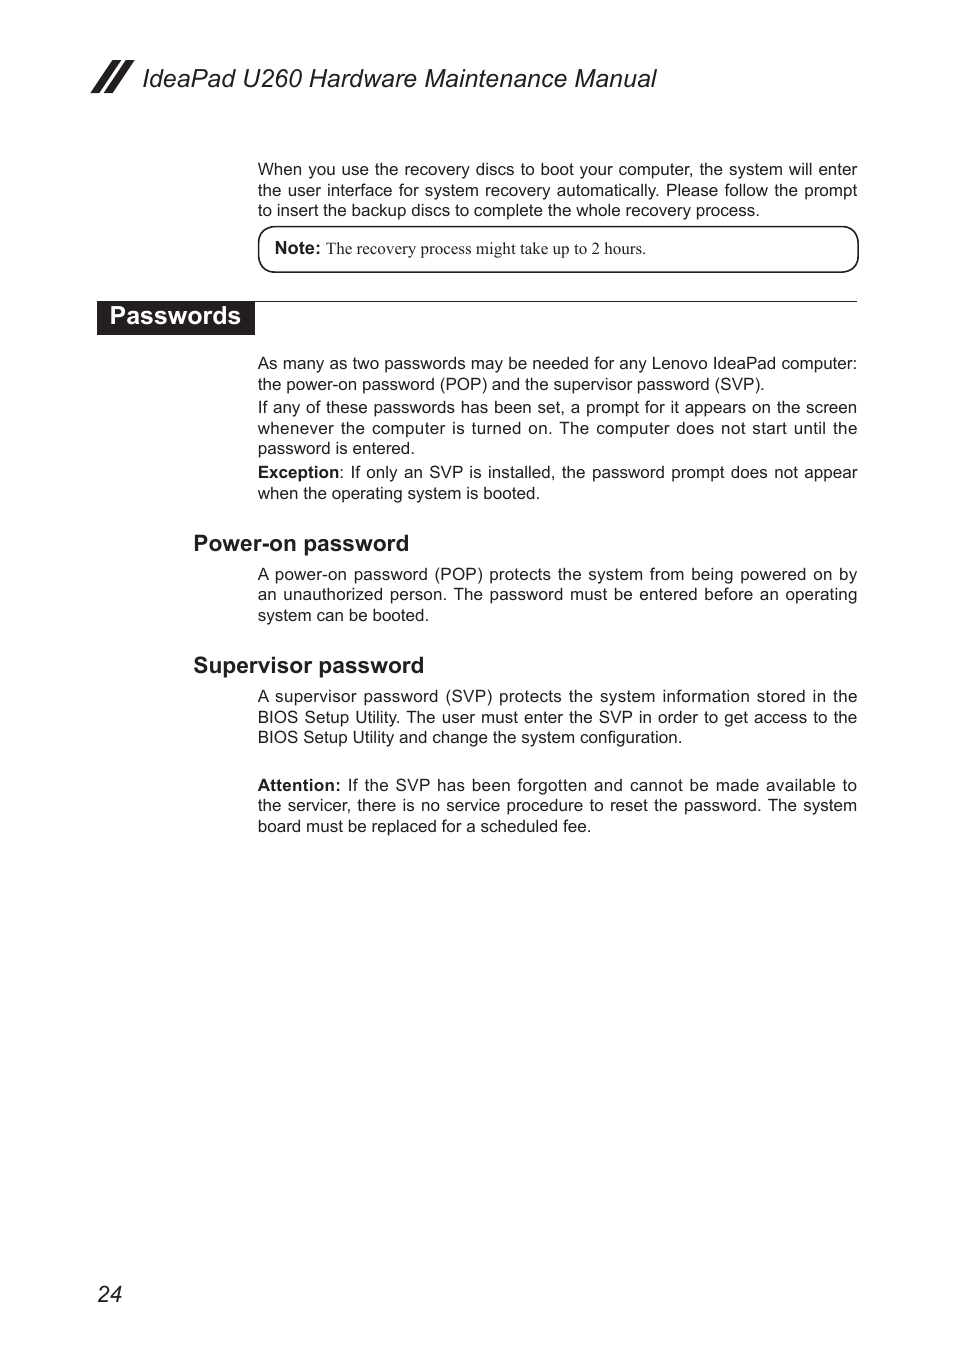 Passwords, Power-on password, Supervisor password | Lenovo IdeaPad